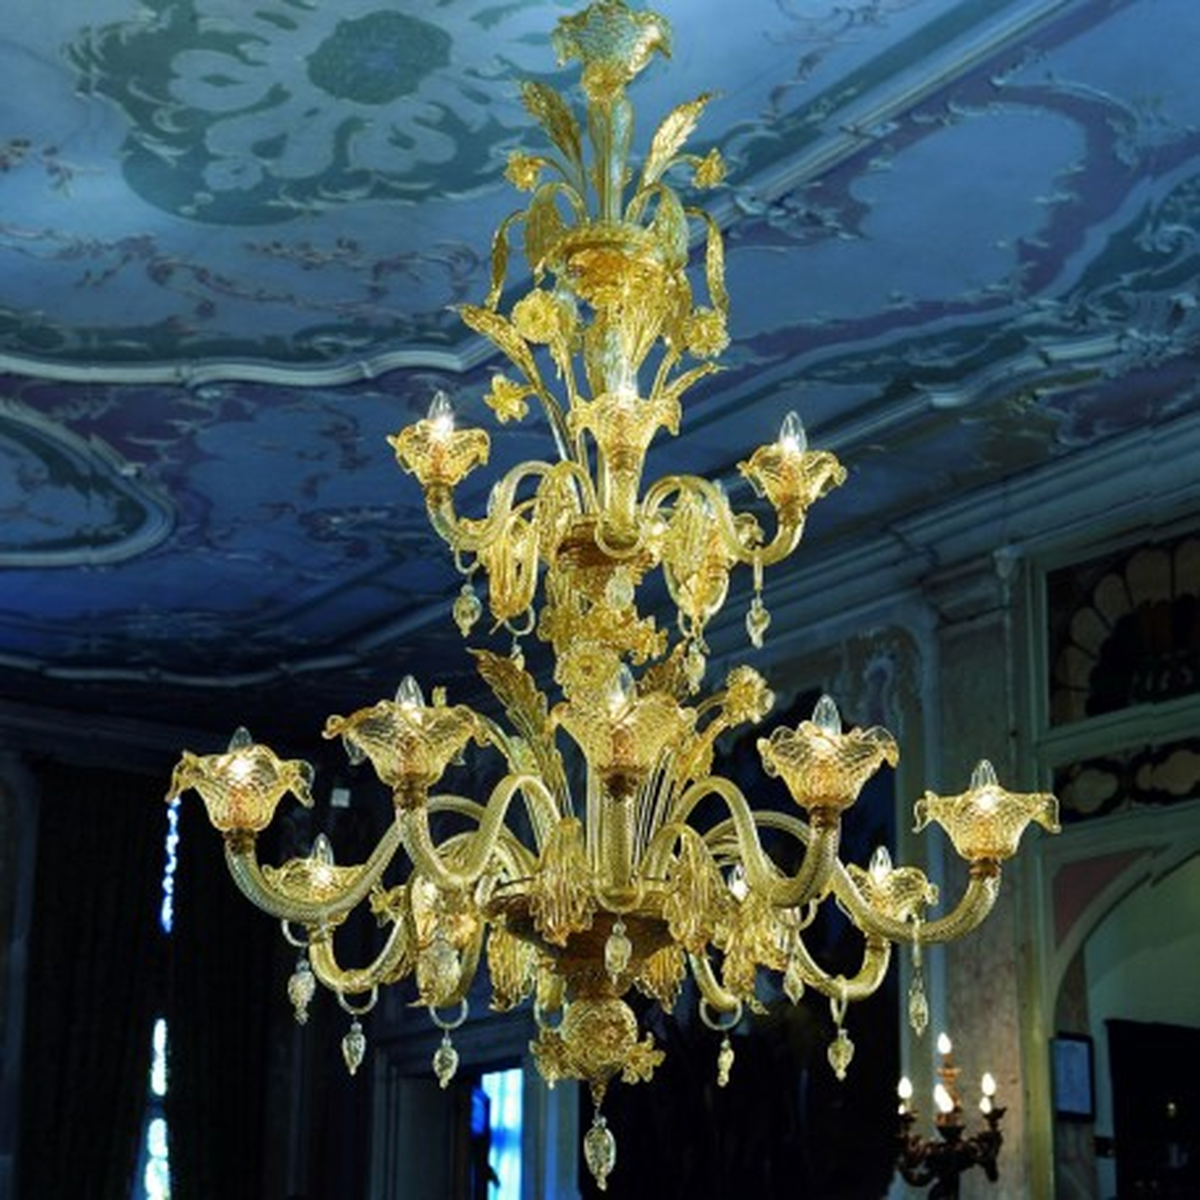 """Artemisia"" lustre en verre de Murano - 10+5 lumieres - couleur ambre or"